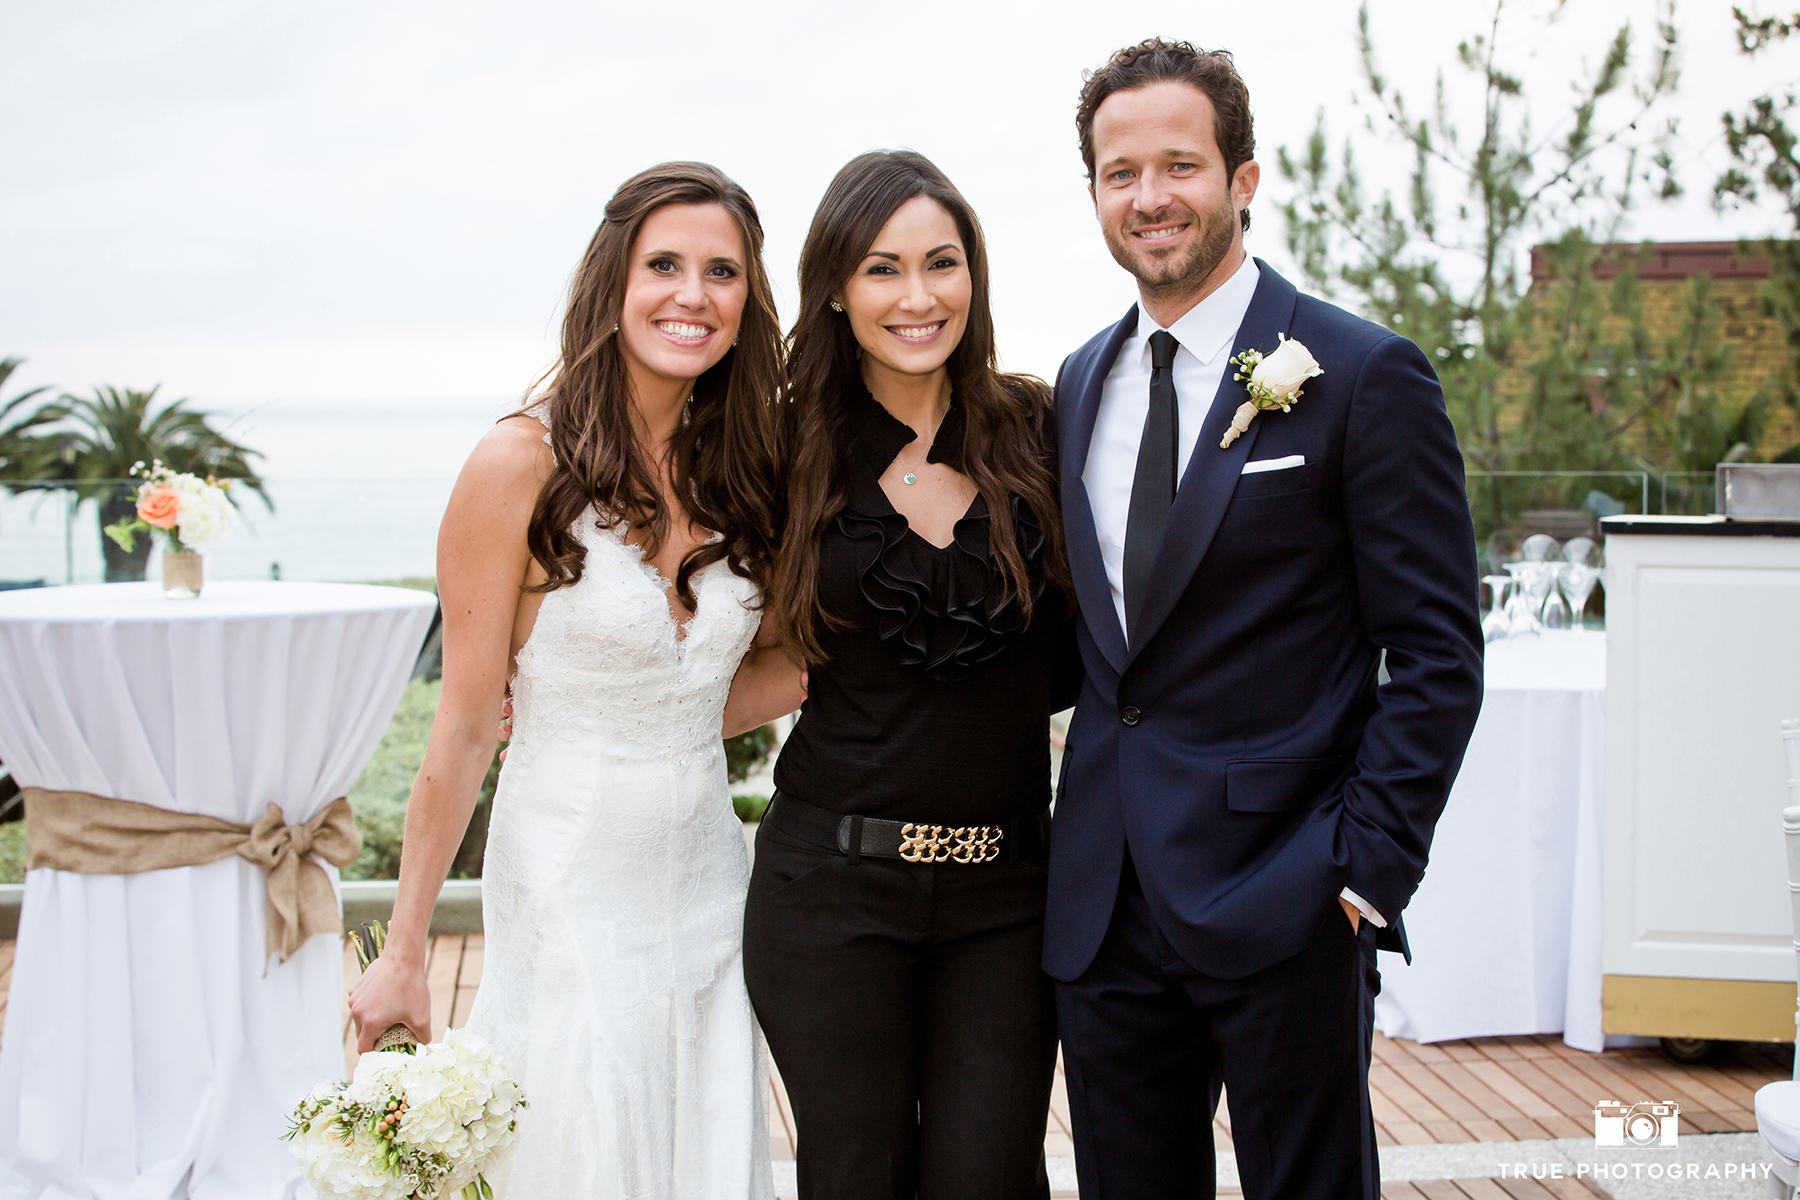 Dalice, Katie and Robert.jpg